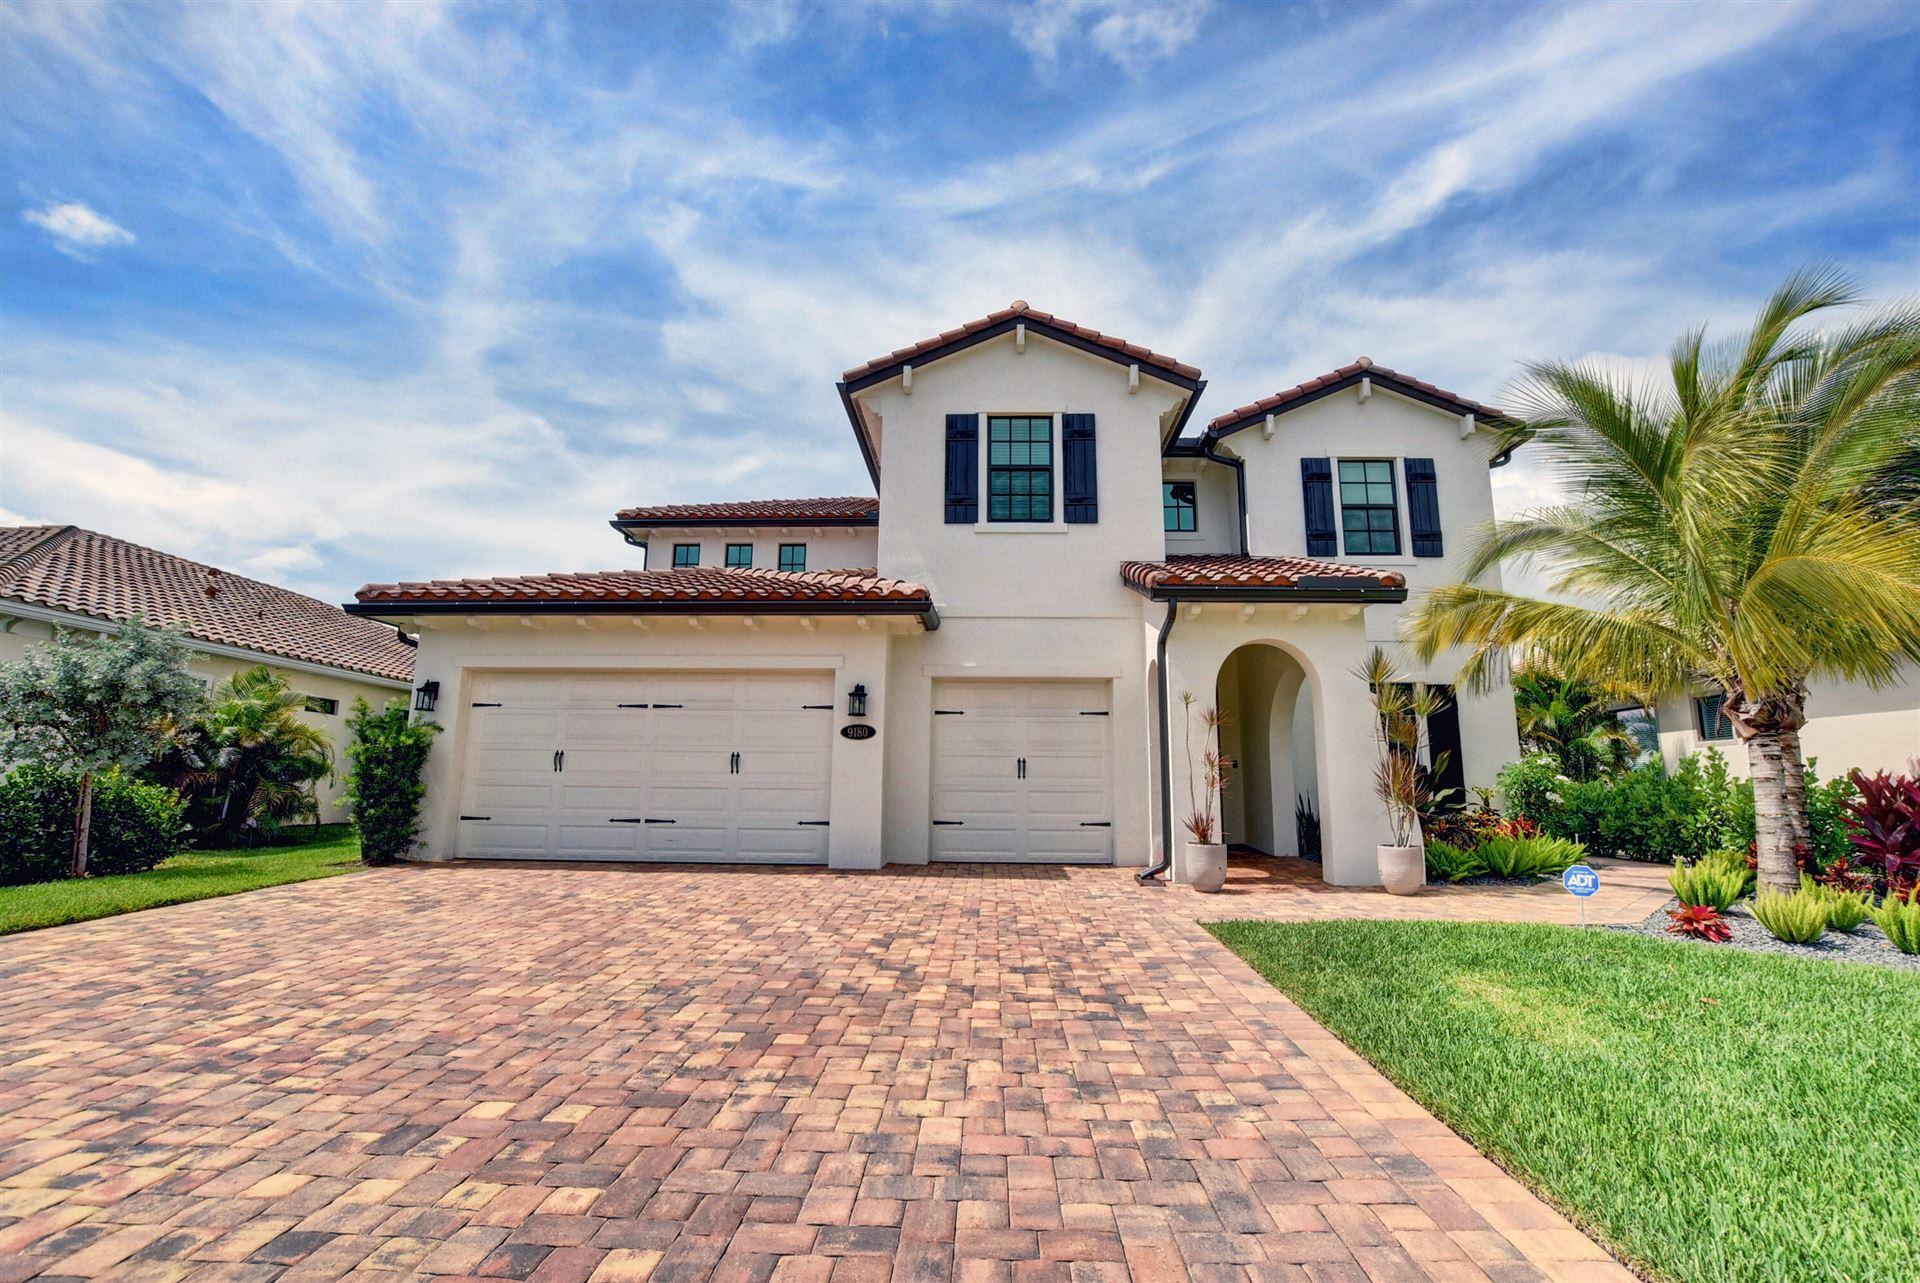 9180 Grand Prix Lane, Boynton Beach, FL 33472 - MLS#: RX-10724297